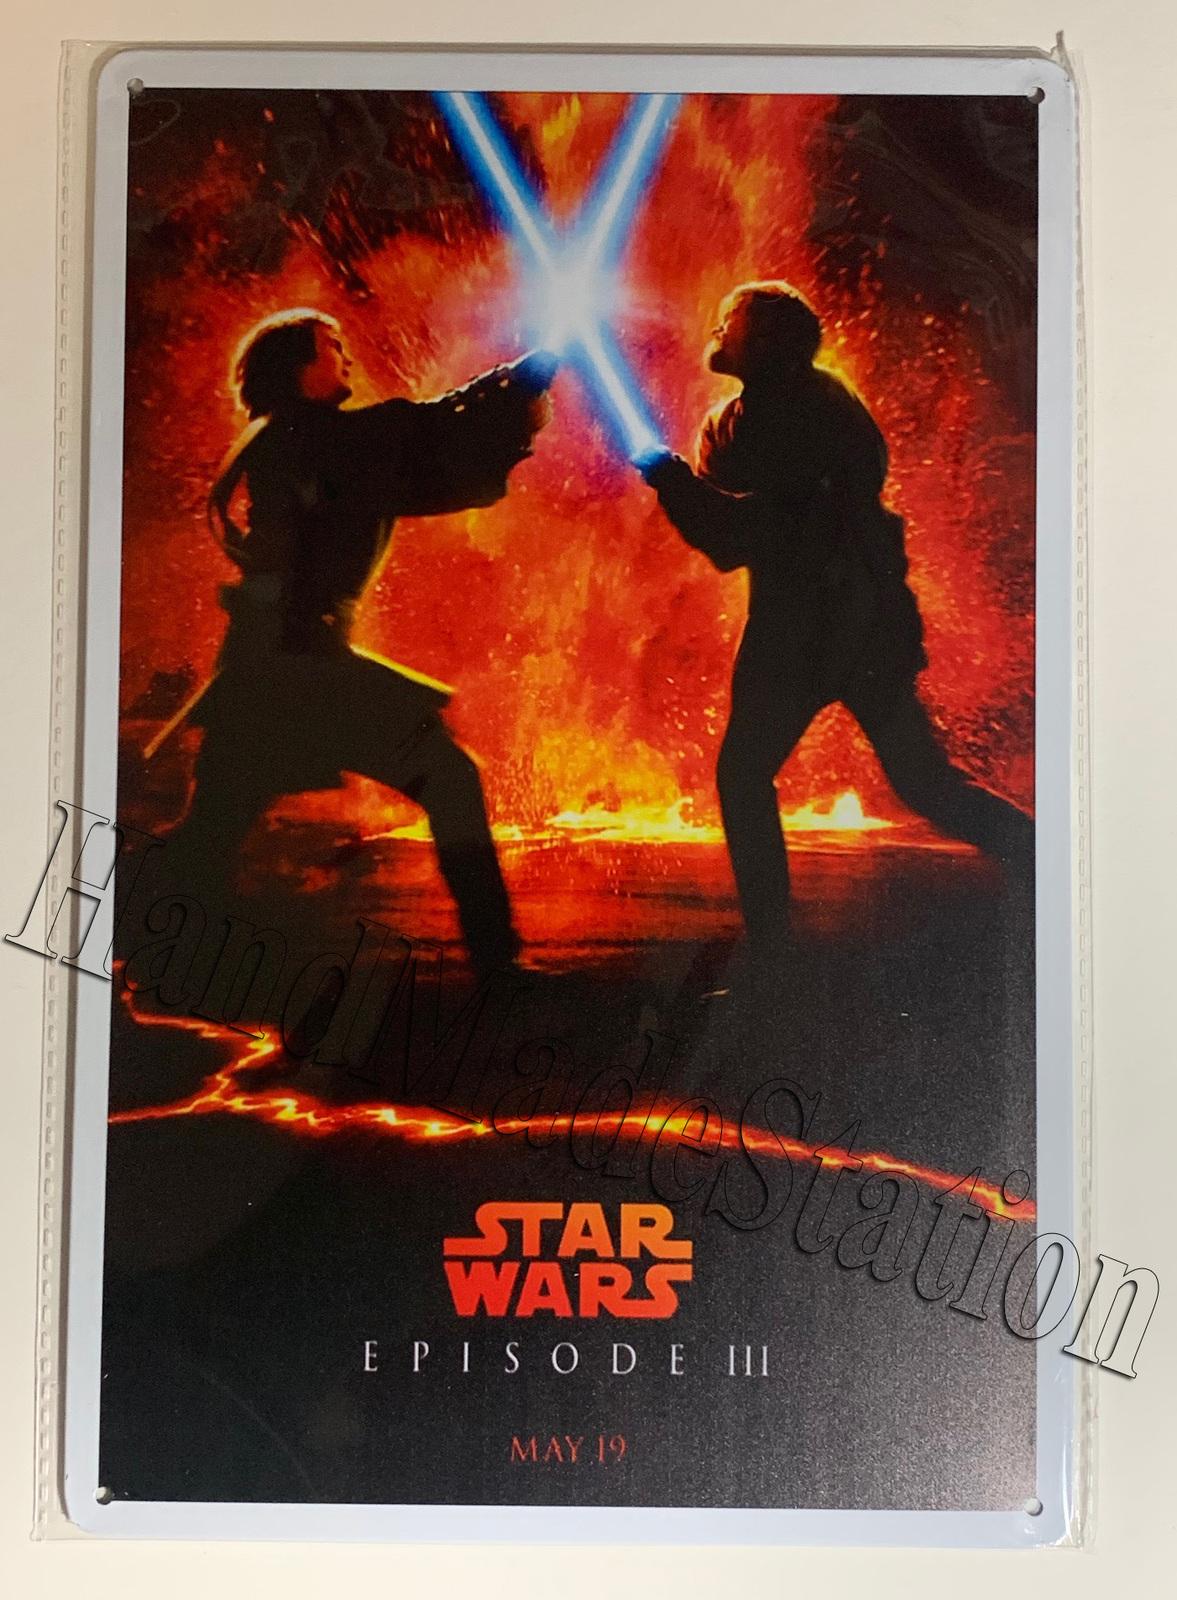 Star wars19